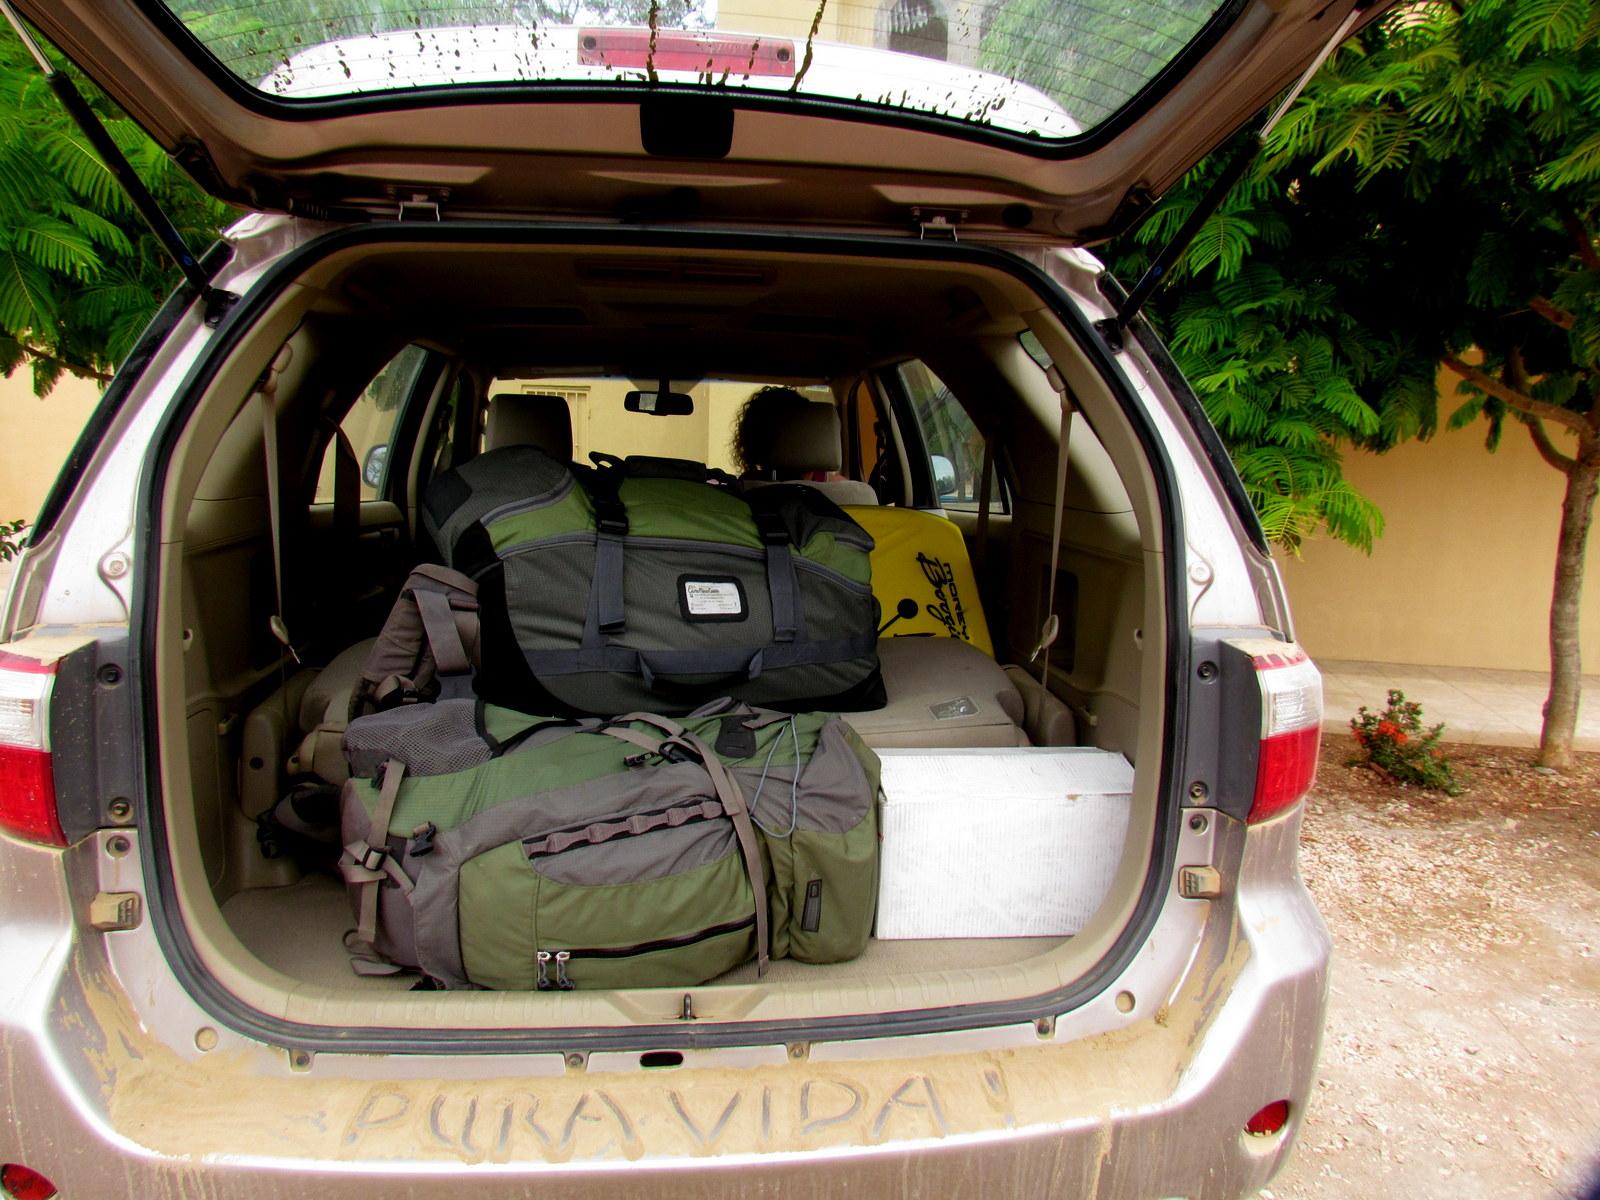 Is a Four Wheel Drive SUV Necessary in Costa Rica?